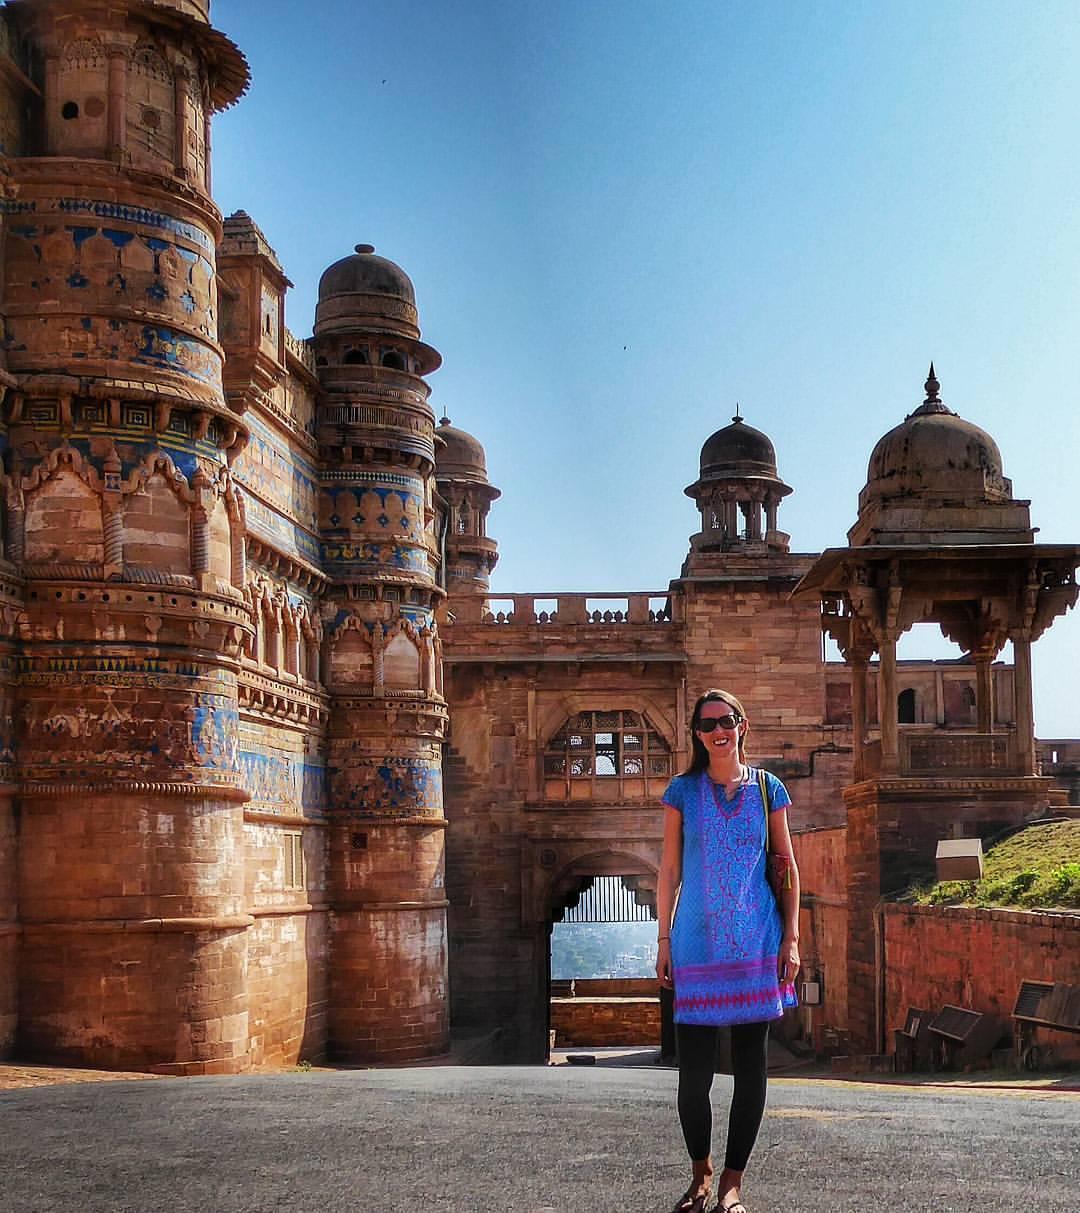 Anna Gwalior Fort, Madhya Pradesh, solo female travel in india, femal travel, women travel in india